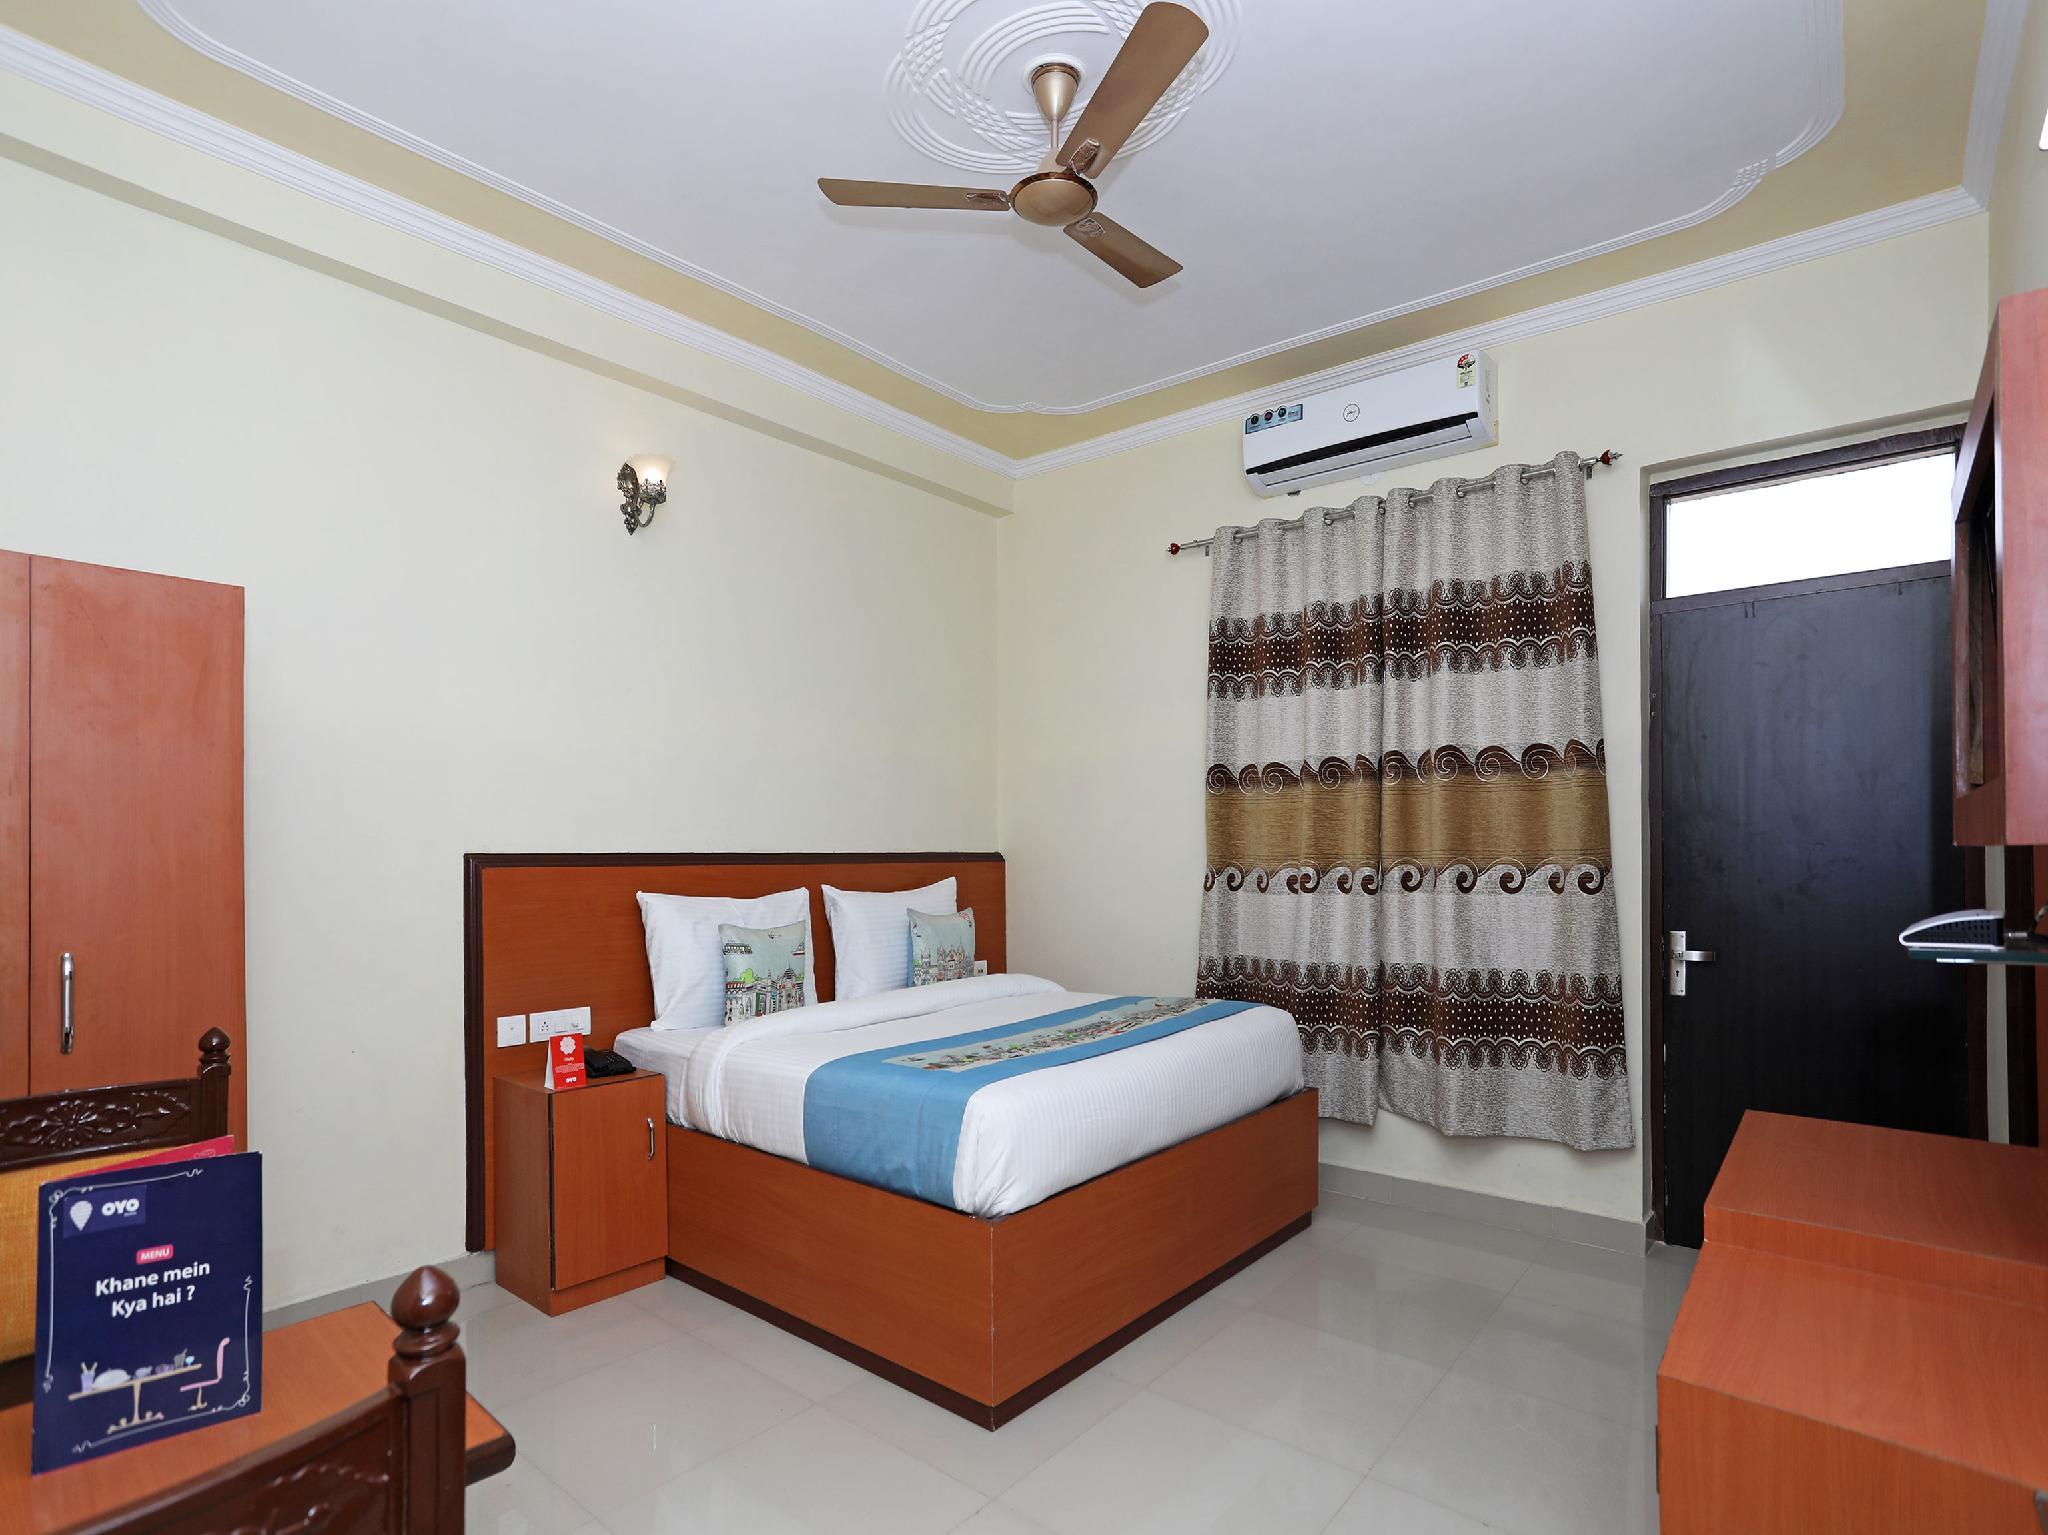 OYO 9973 Hotel Green Valley